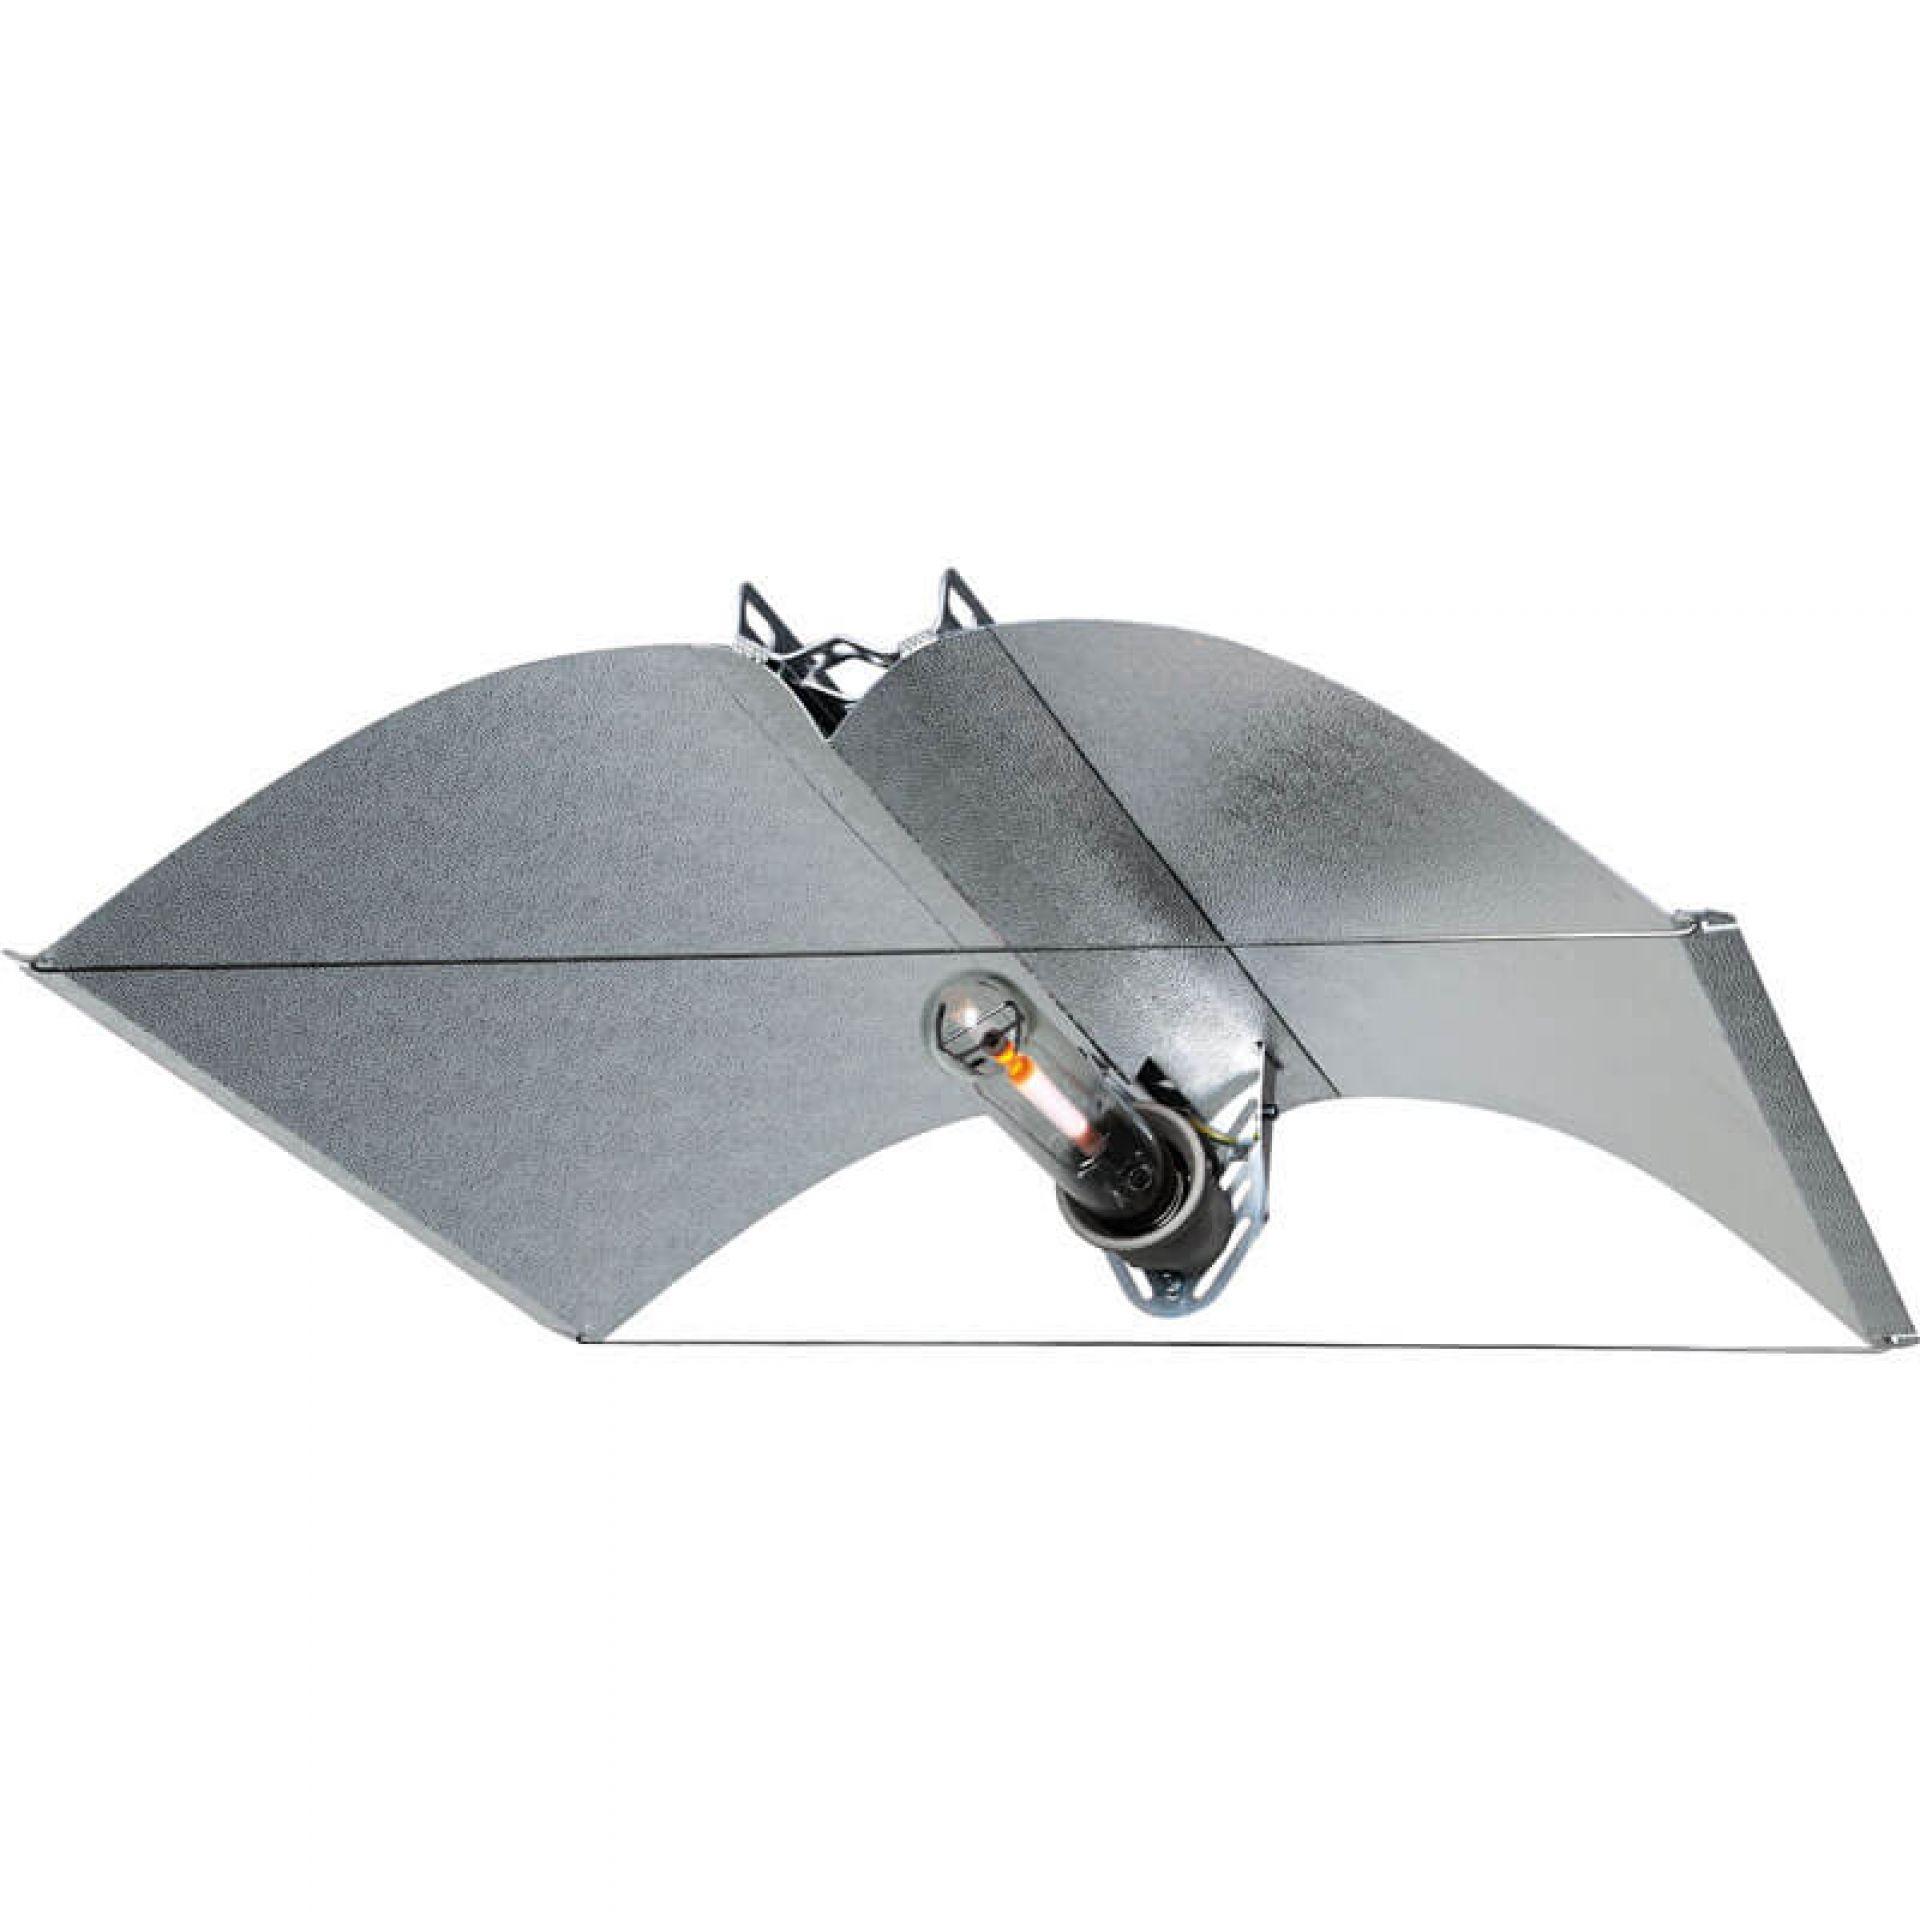 Azerwing midi (Adjust-a-Wing)